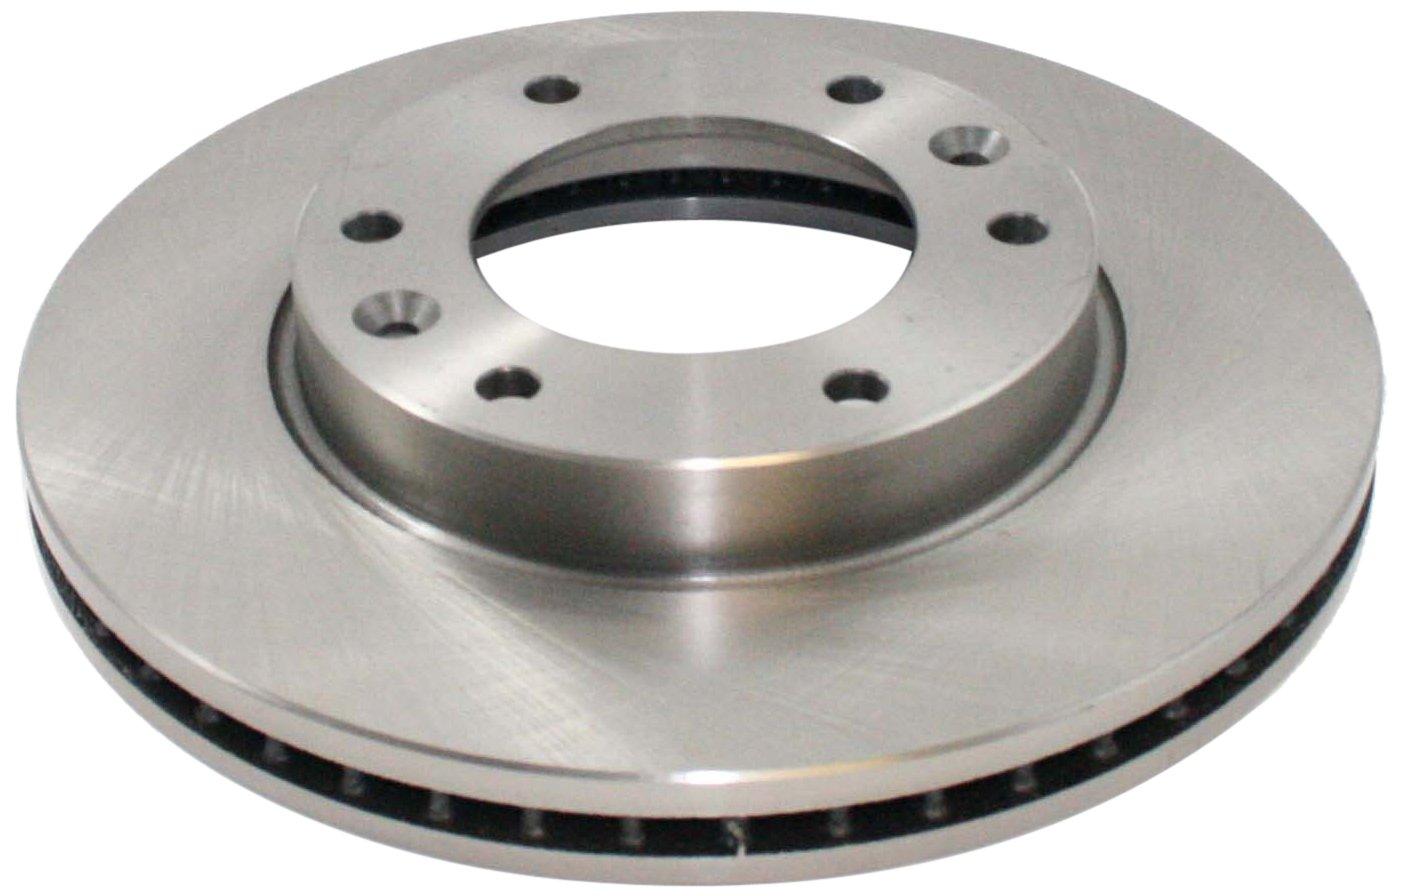 DuraGo BR900288 Front Vented Disc Brake Rotor